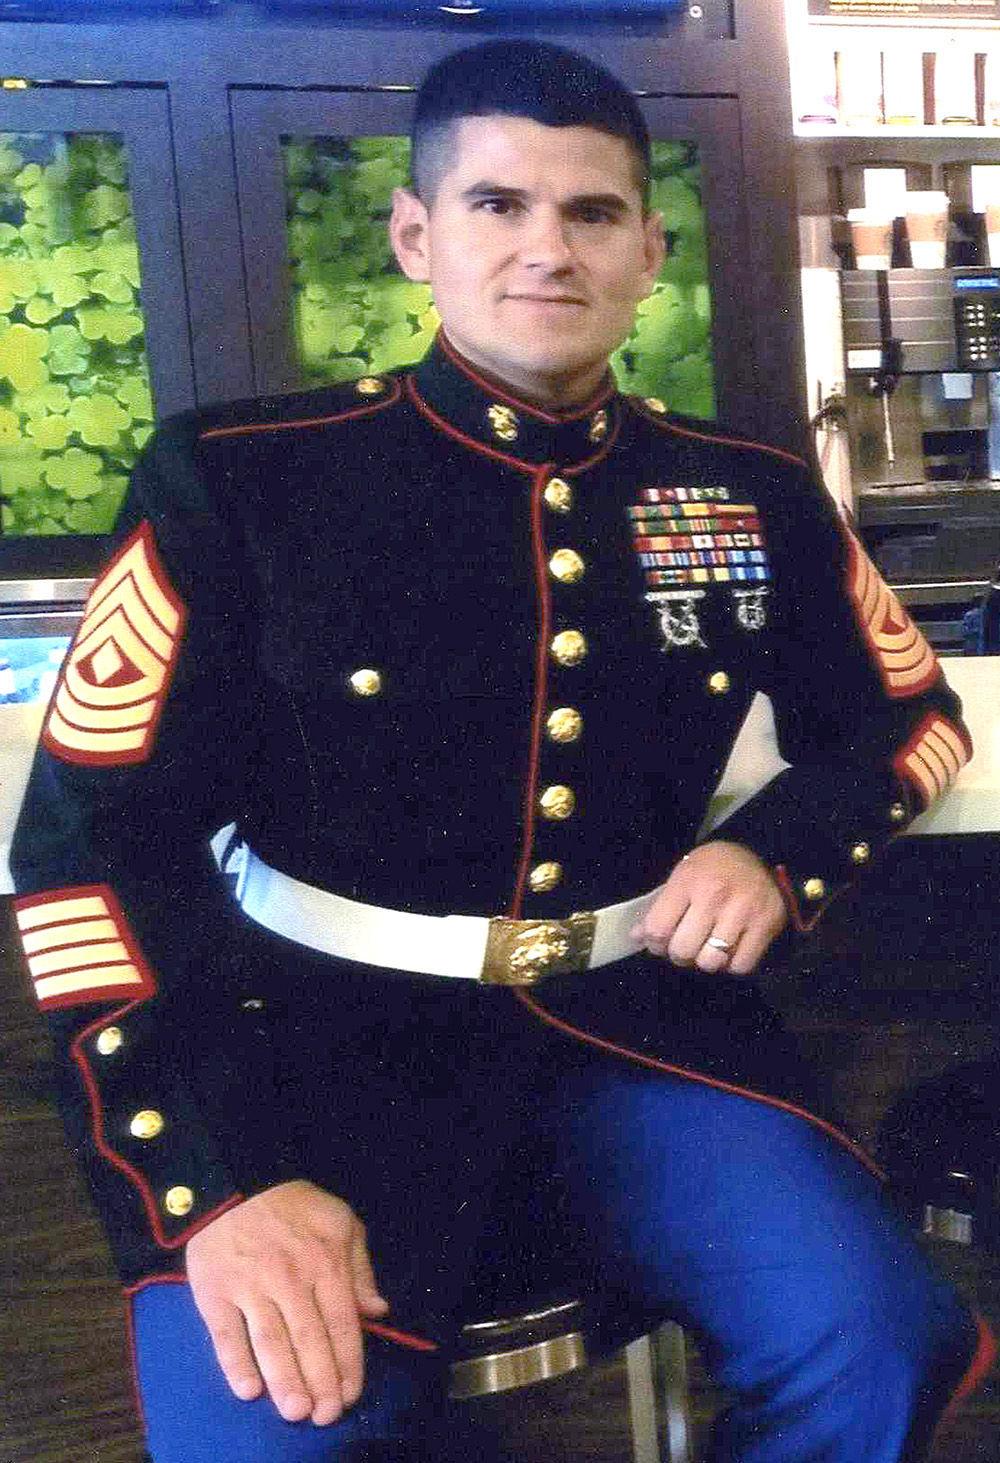 connally grad promoted to marine sergeant major community news